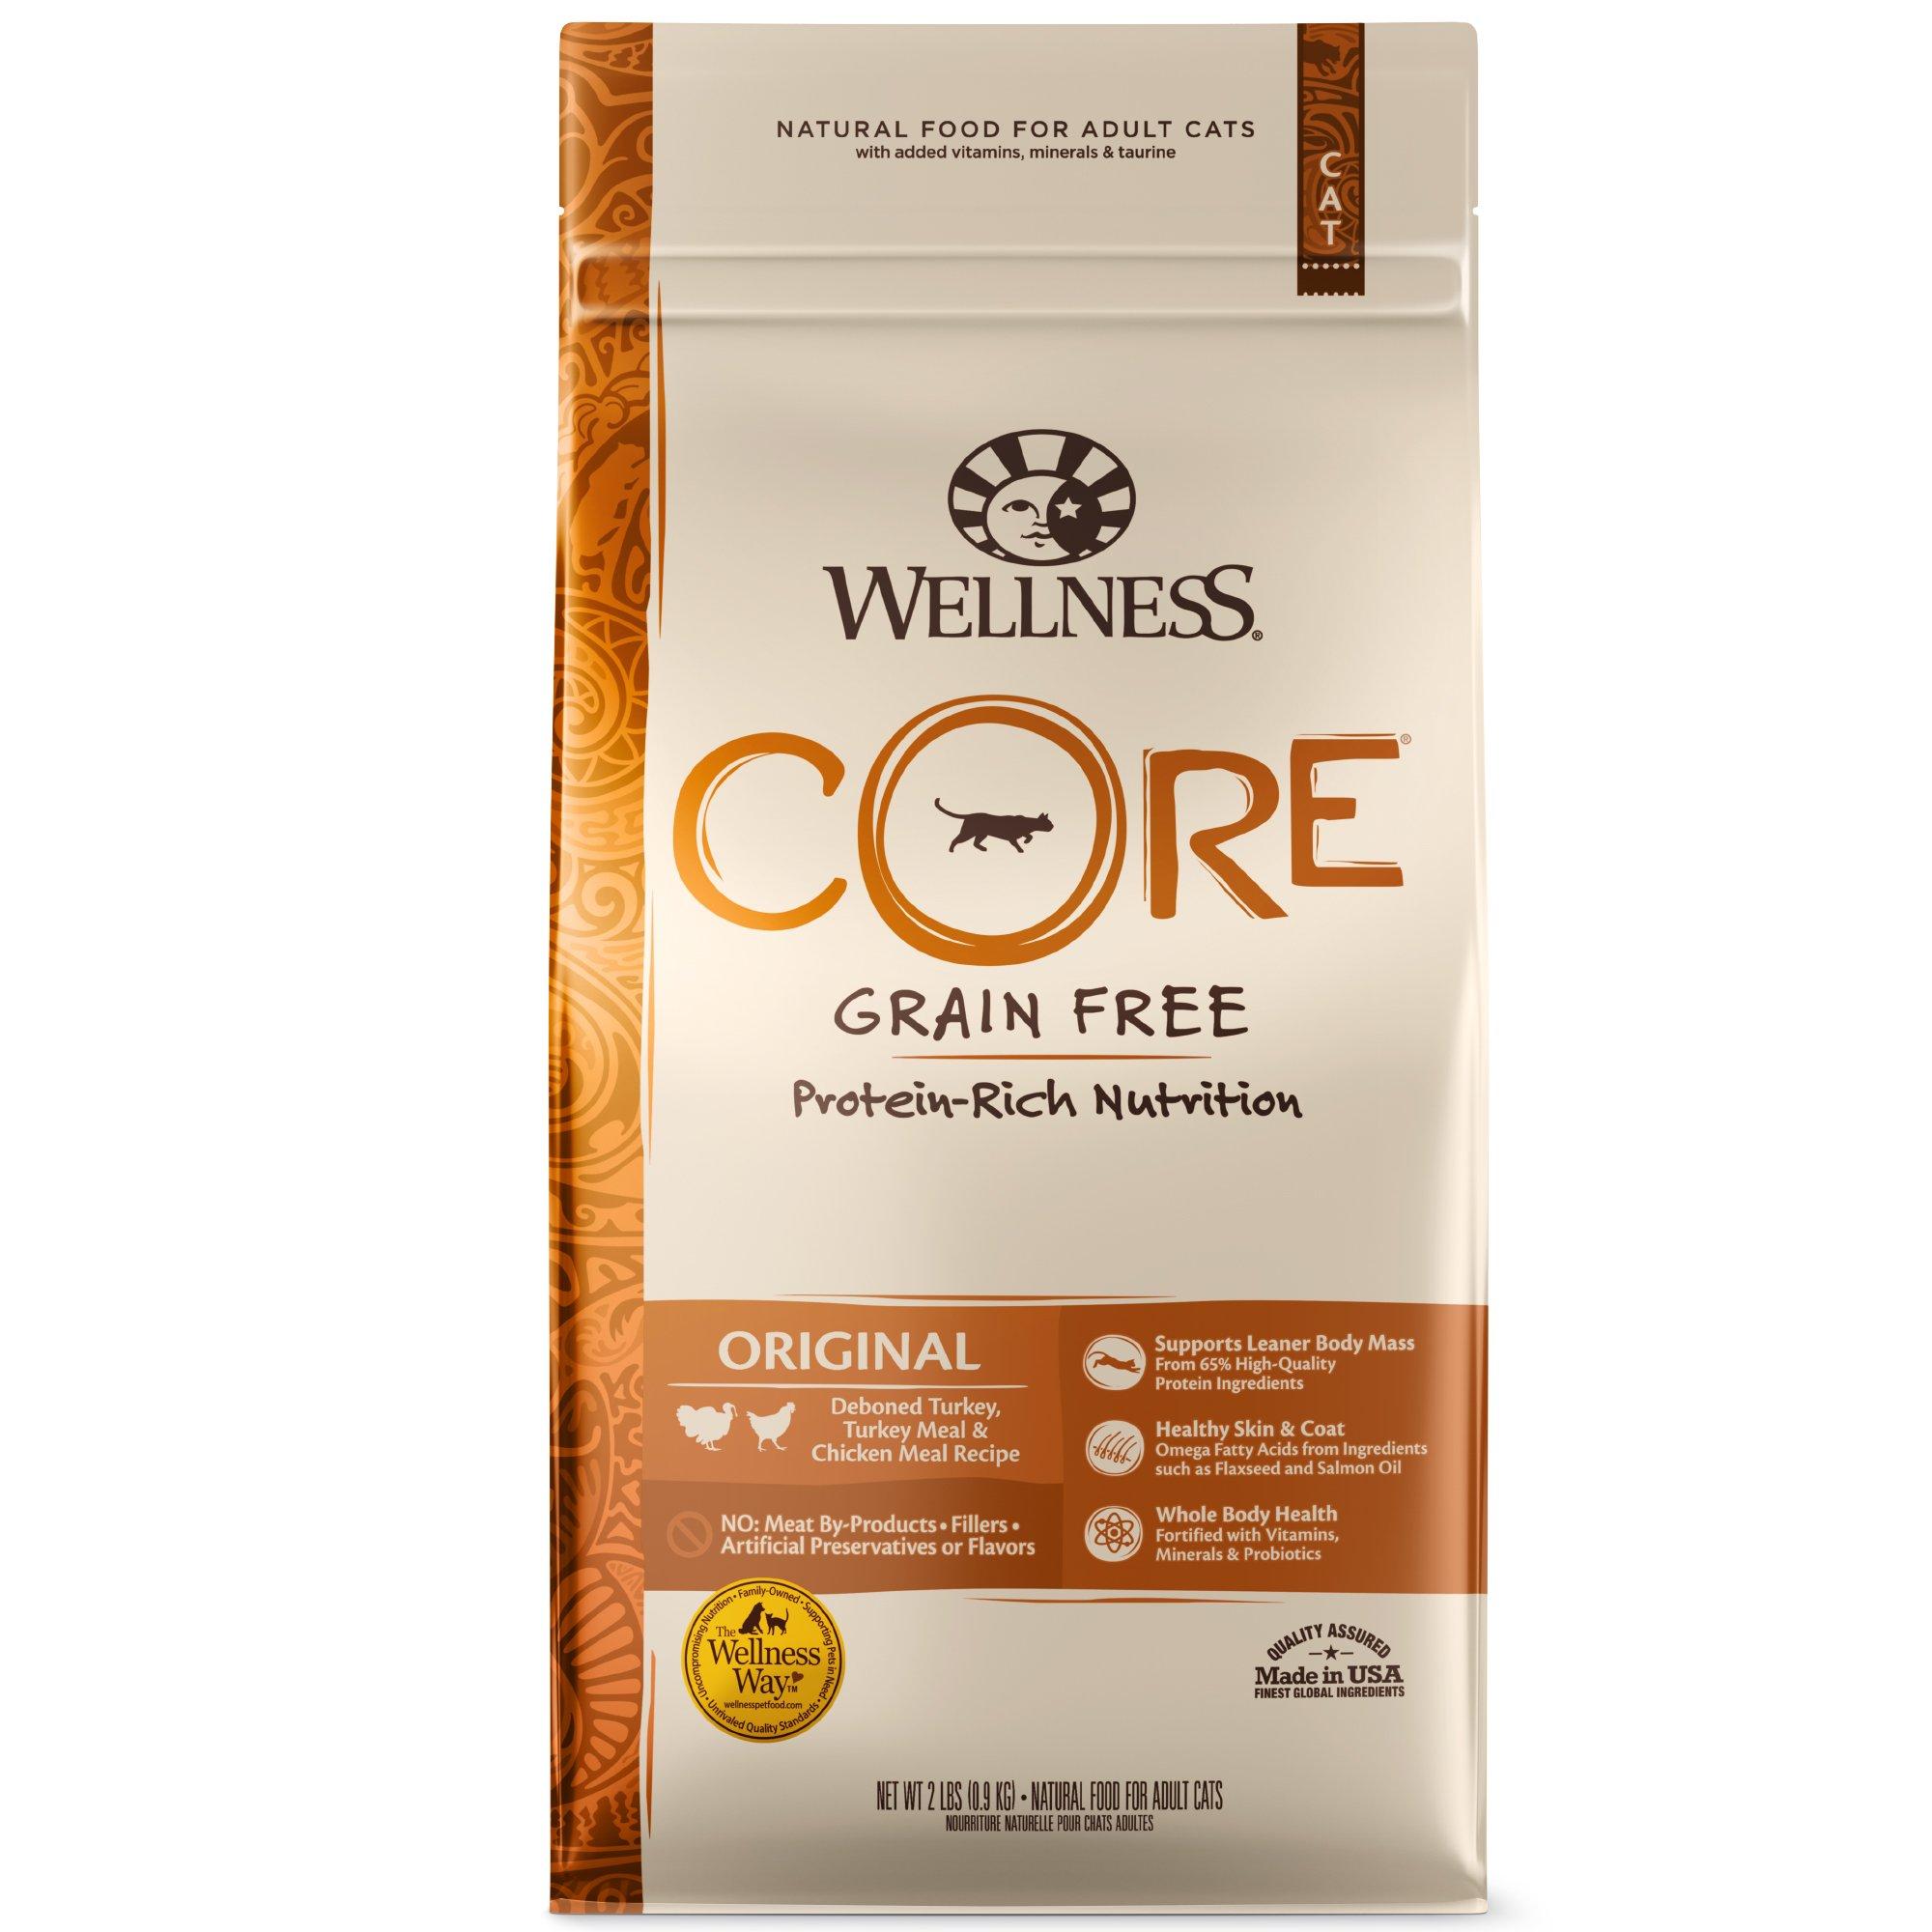 Wellness Core Natural Grain Free Dry Cat Food, Original Turkey & Chicken Recipe, 11-Pound Bag by WELLNESS CORE